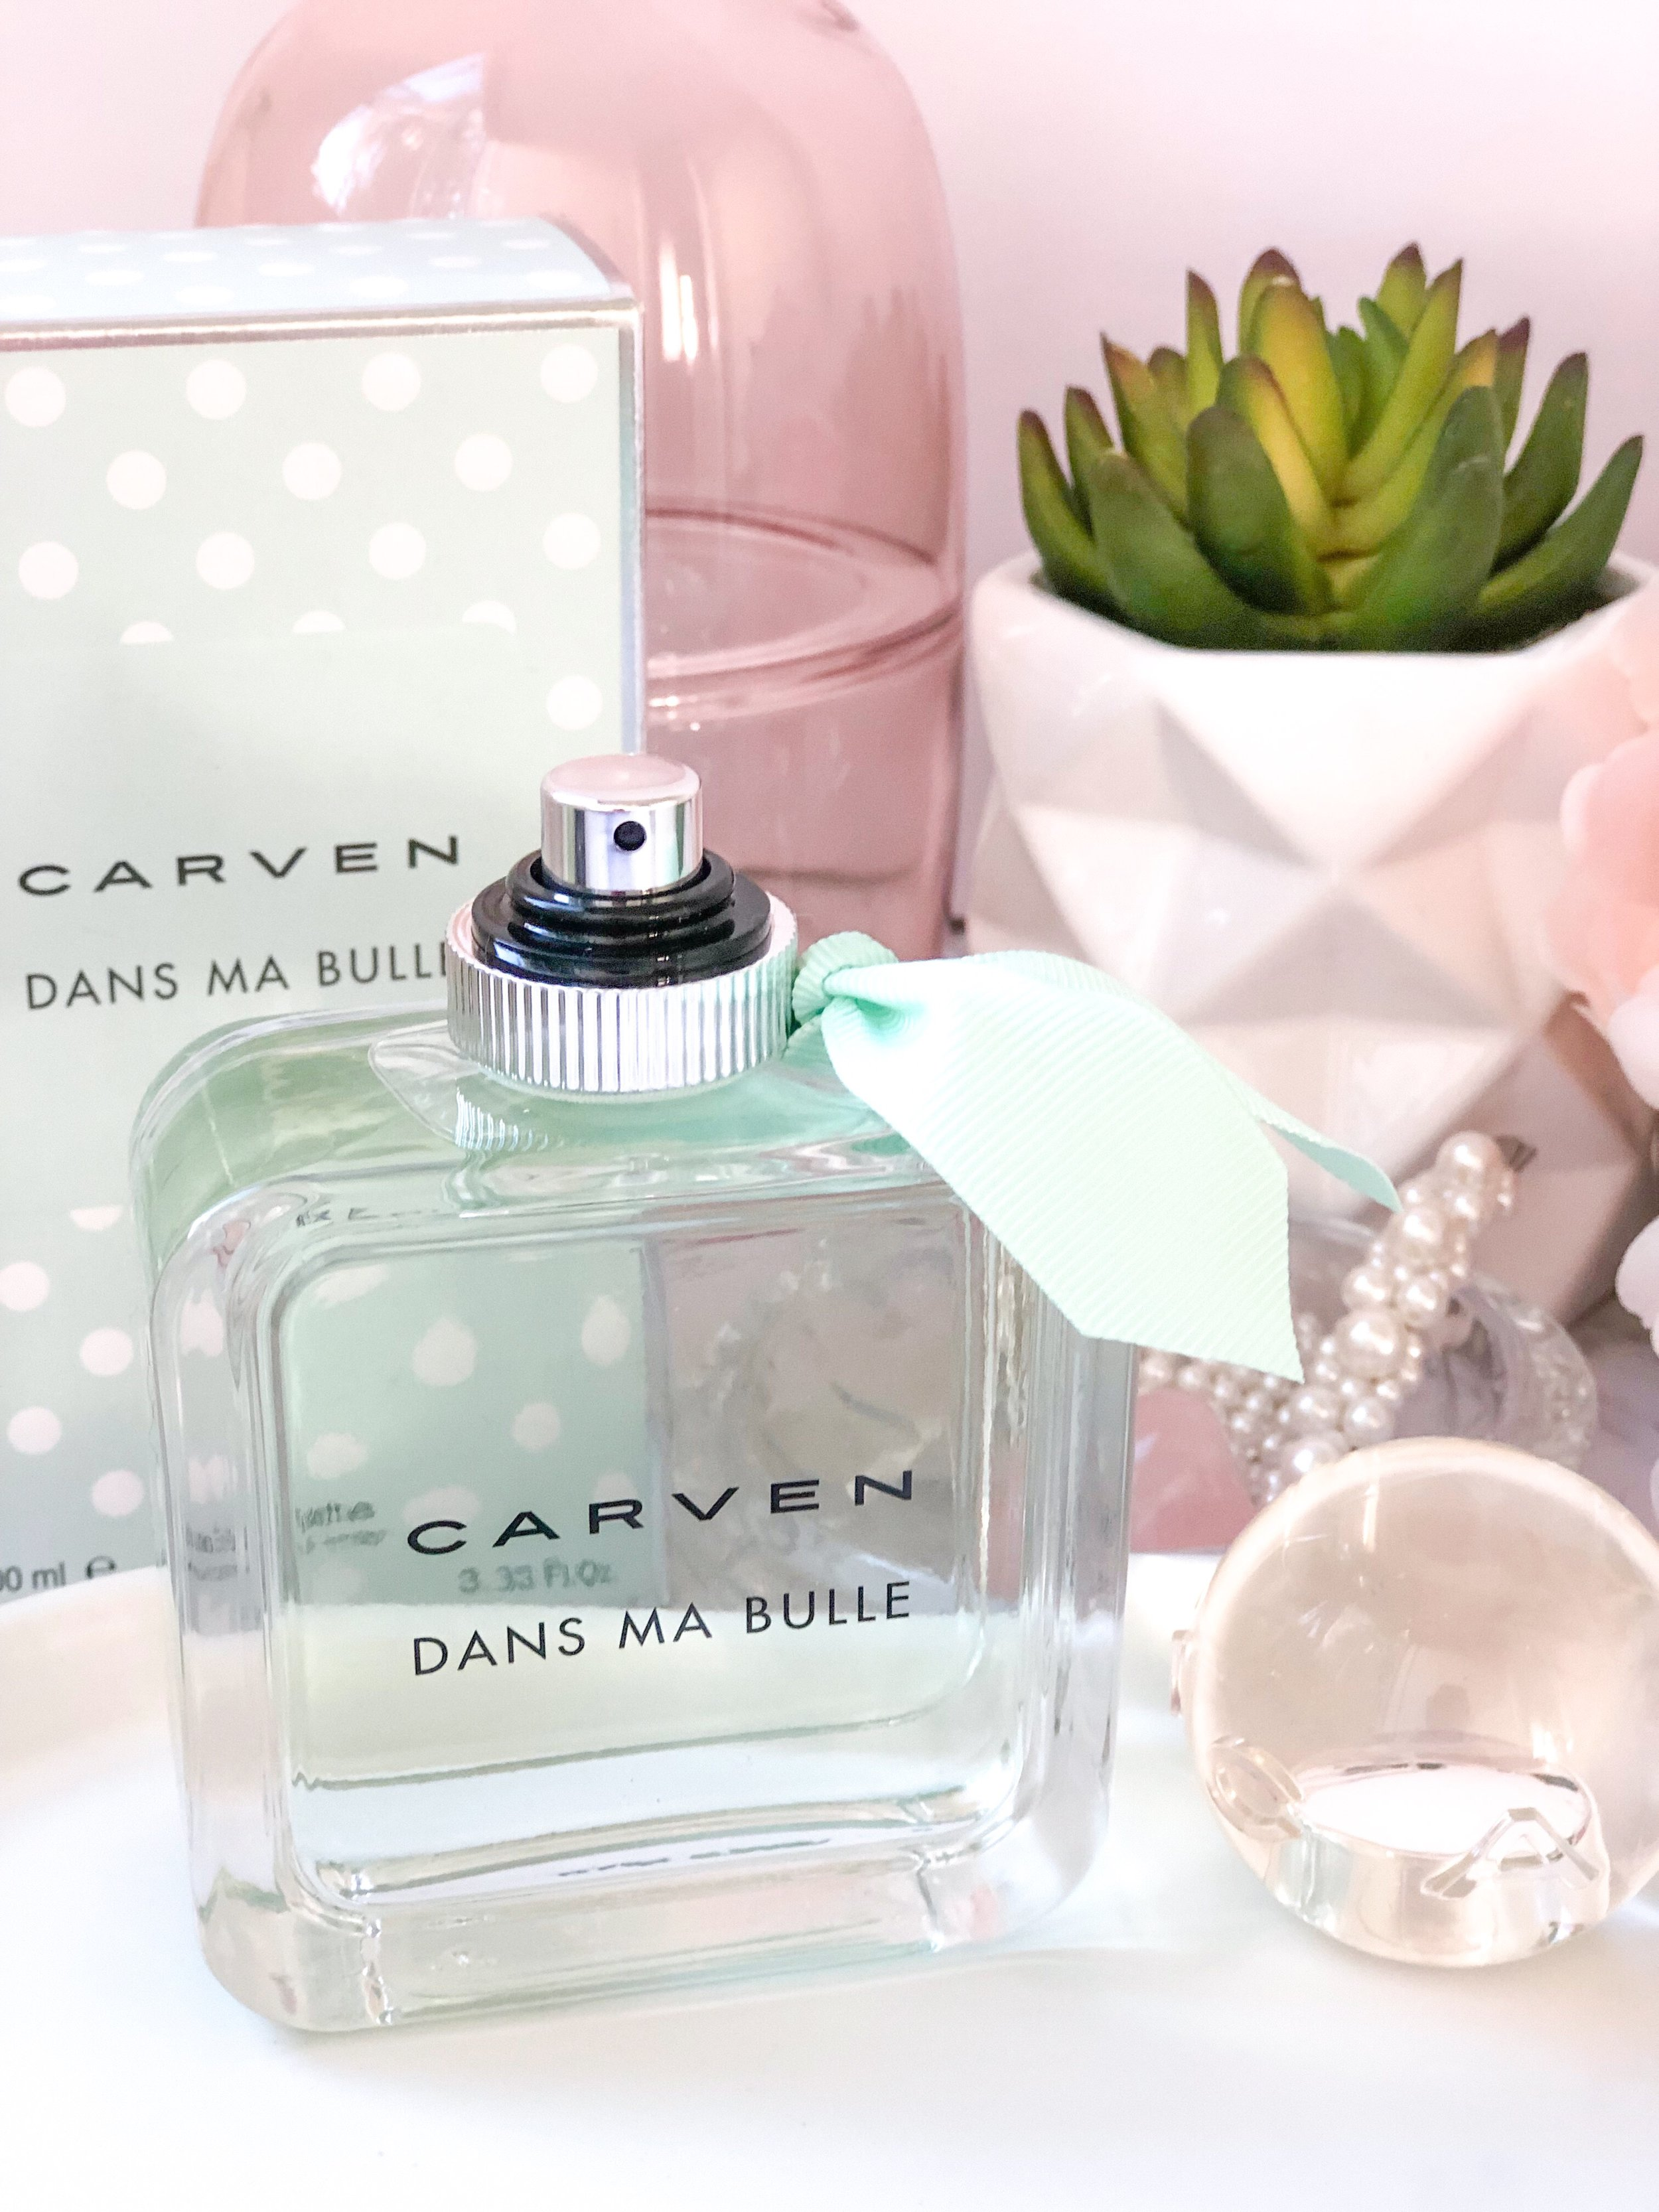 Carven Dans Ma Bulle Perfume.jpg